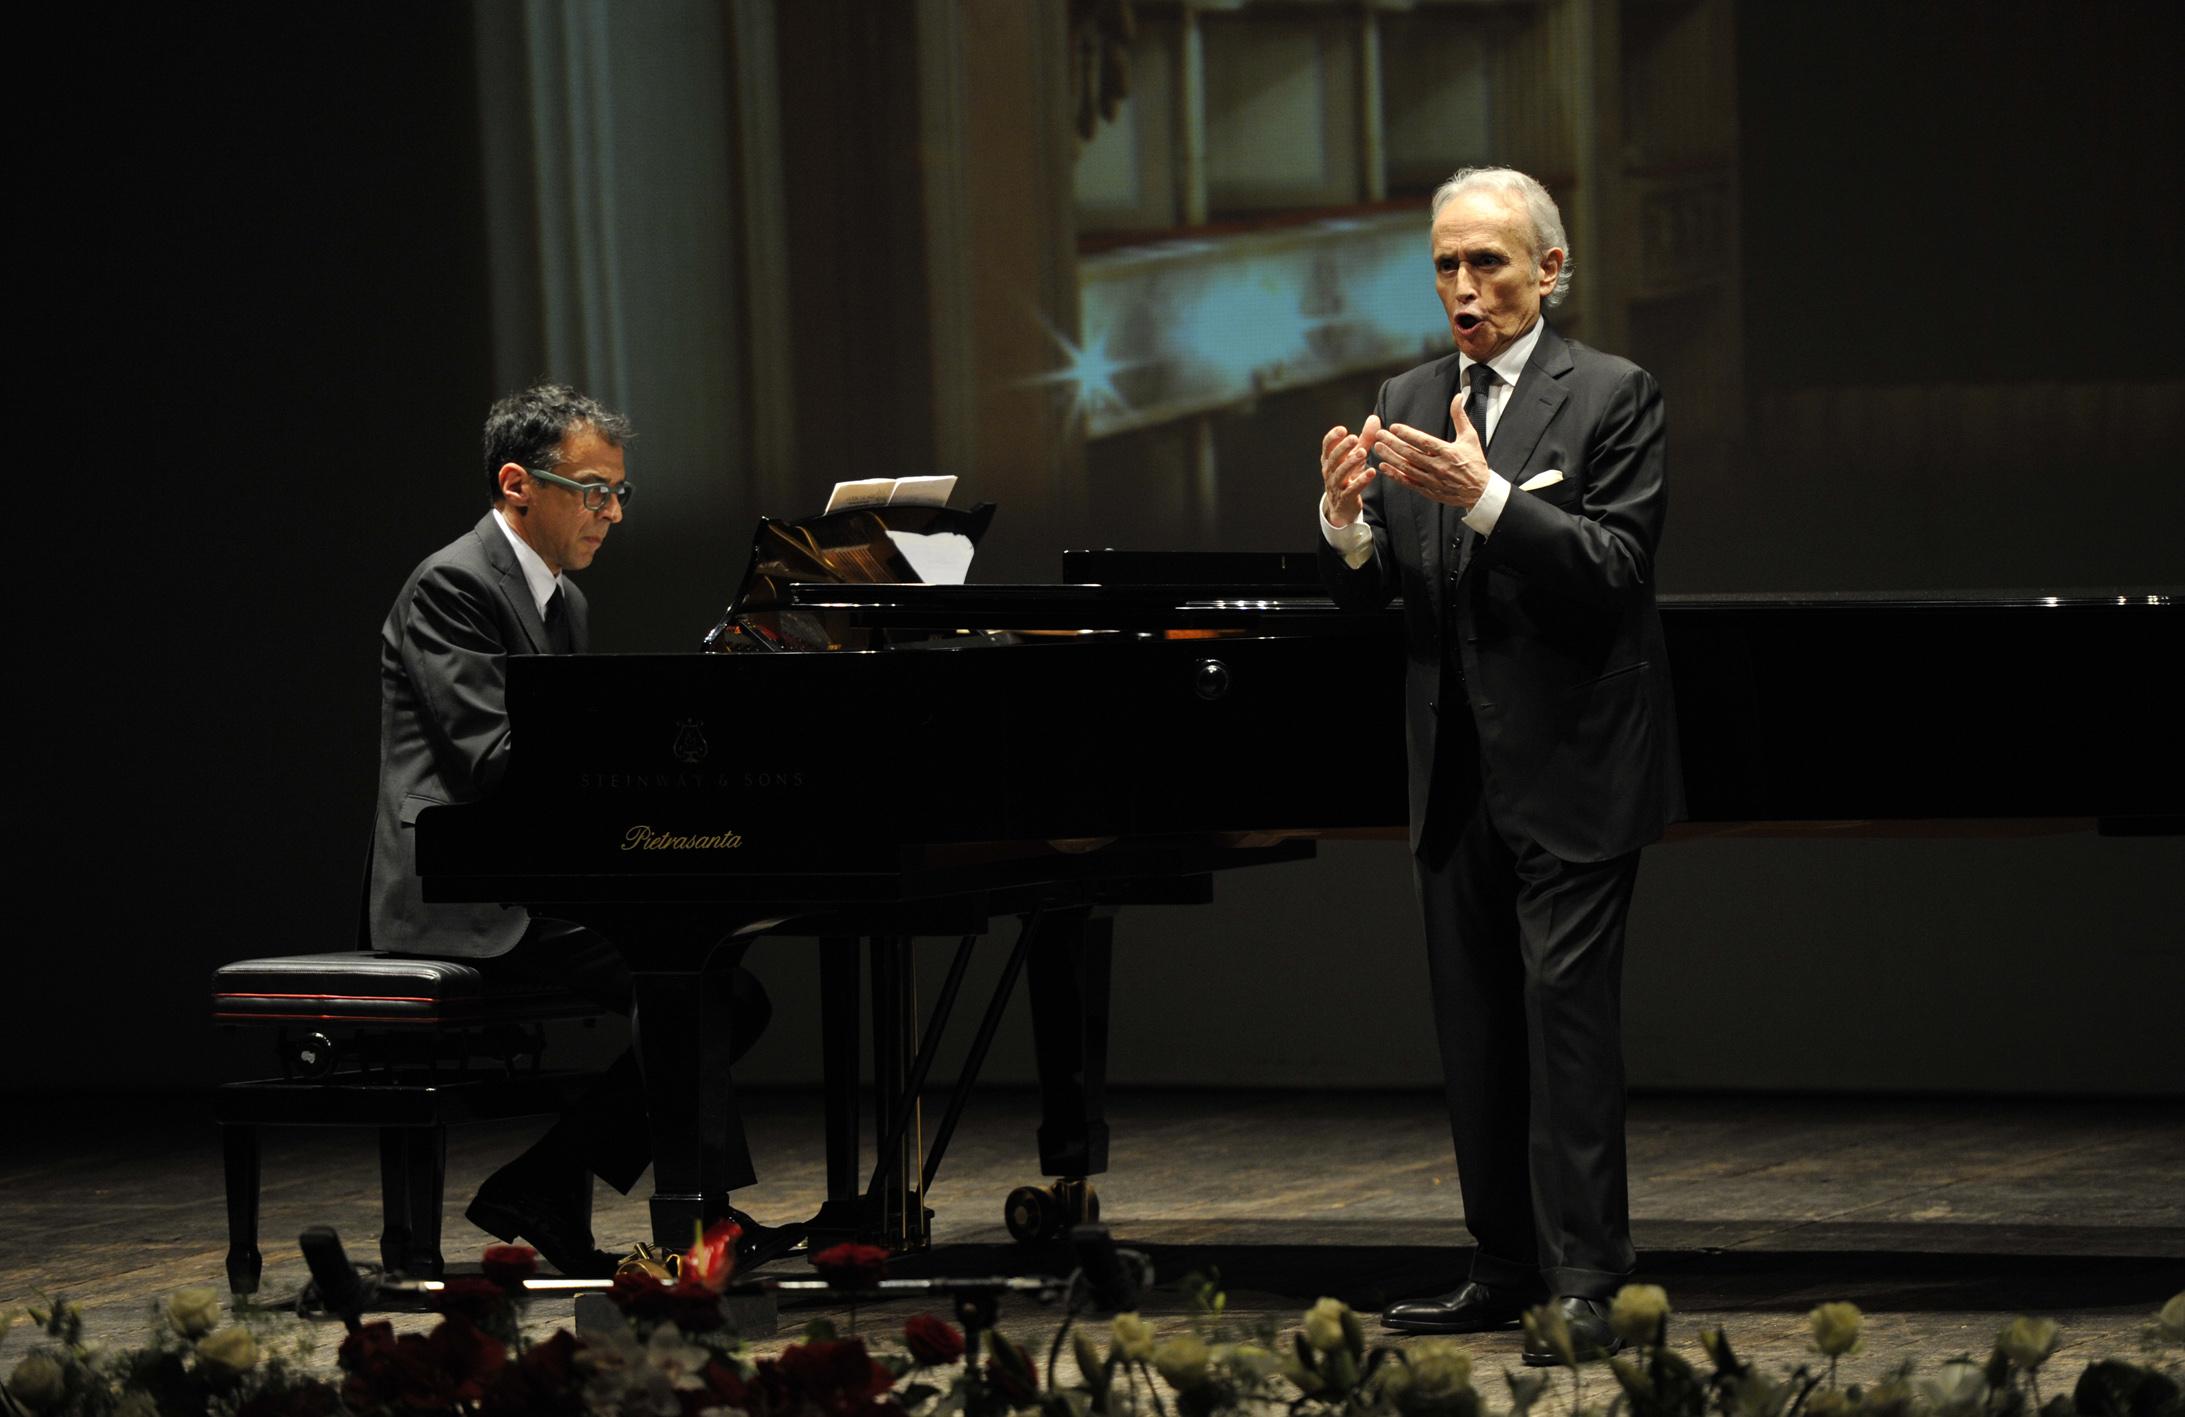 José Carreras in concerto al Teatro del Giglio, al pf Lorenzo Bavaj (Foto Alcide, Lucca)